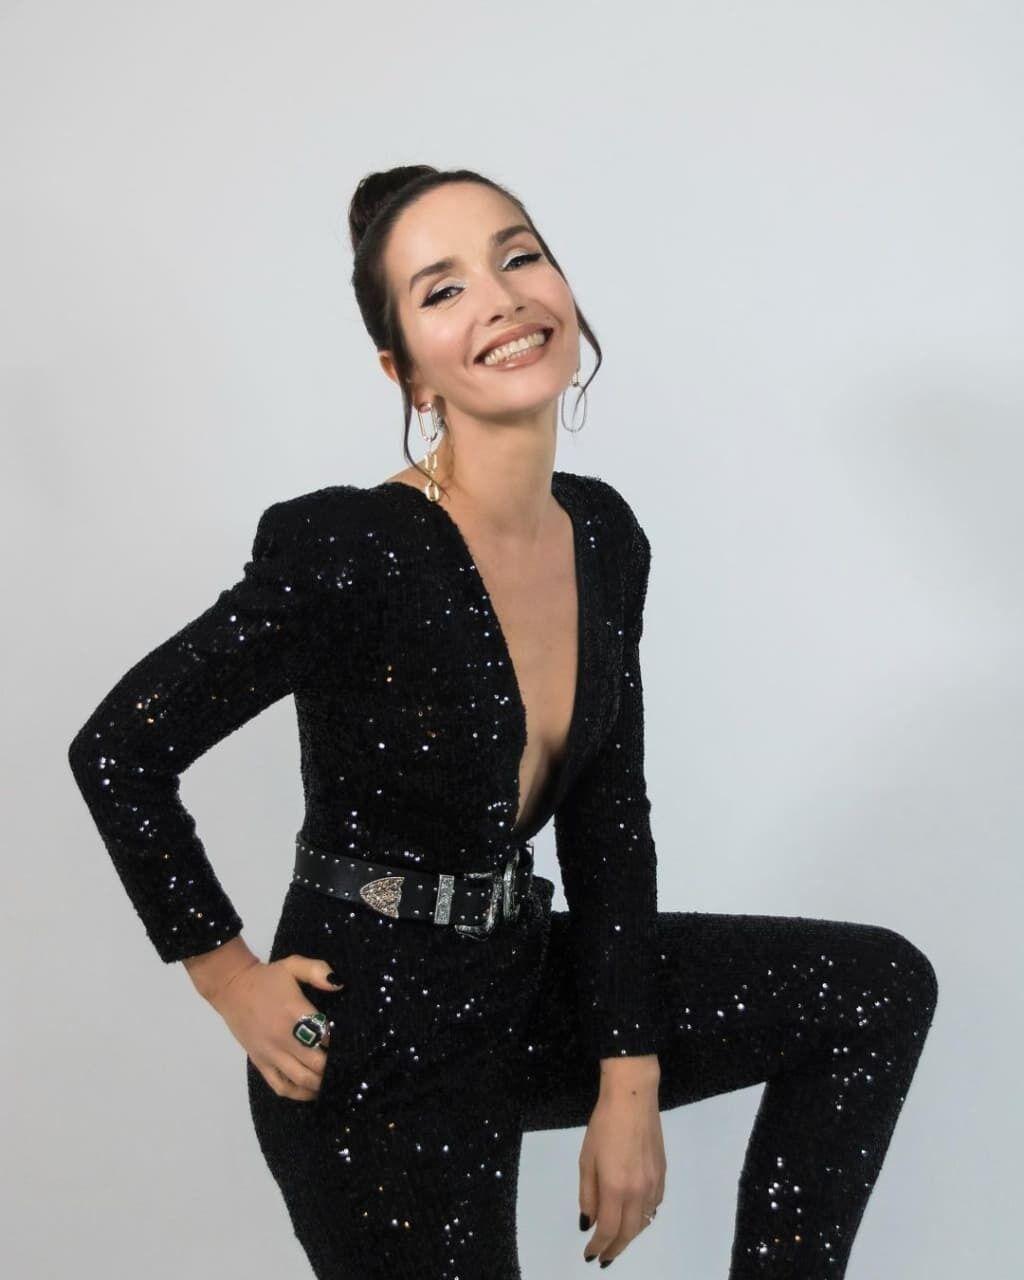 Наталия Орейро в черном наряде.